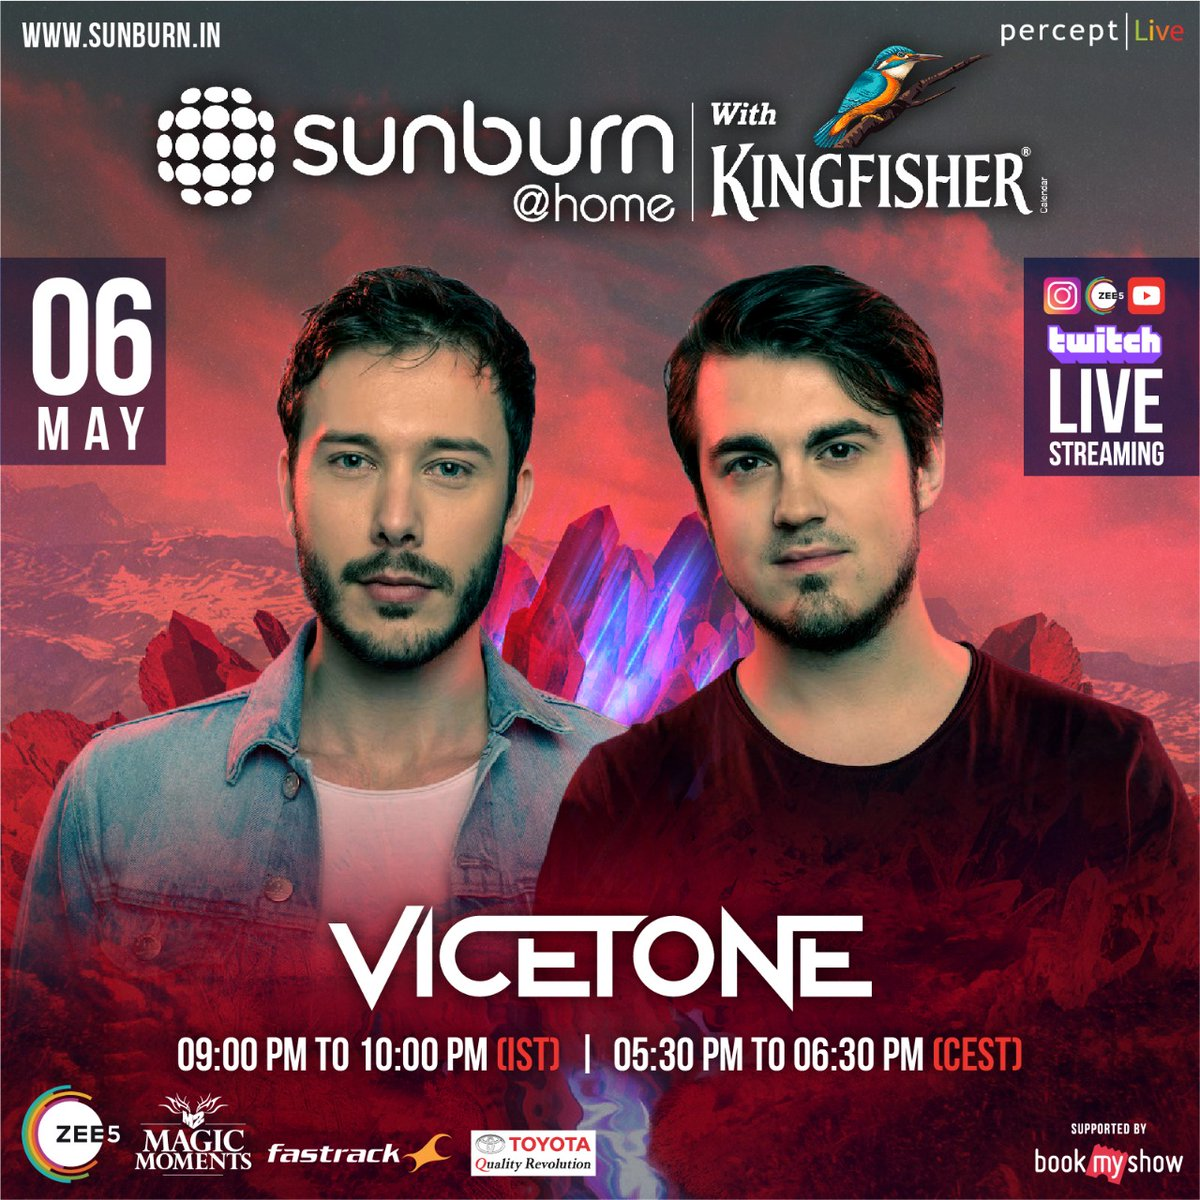 Check out our set at 9pm IST - via twitch.tv/sunburnfestival and other @SunburnFestival platforms #SunburnAtHome